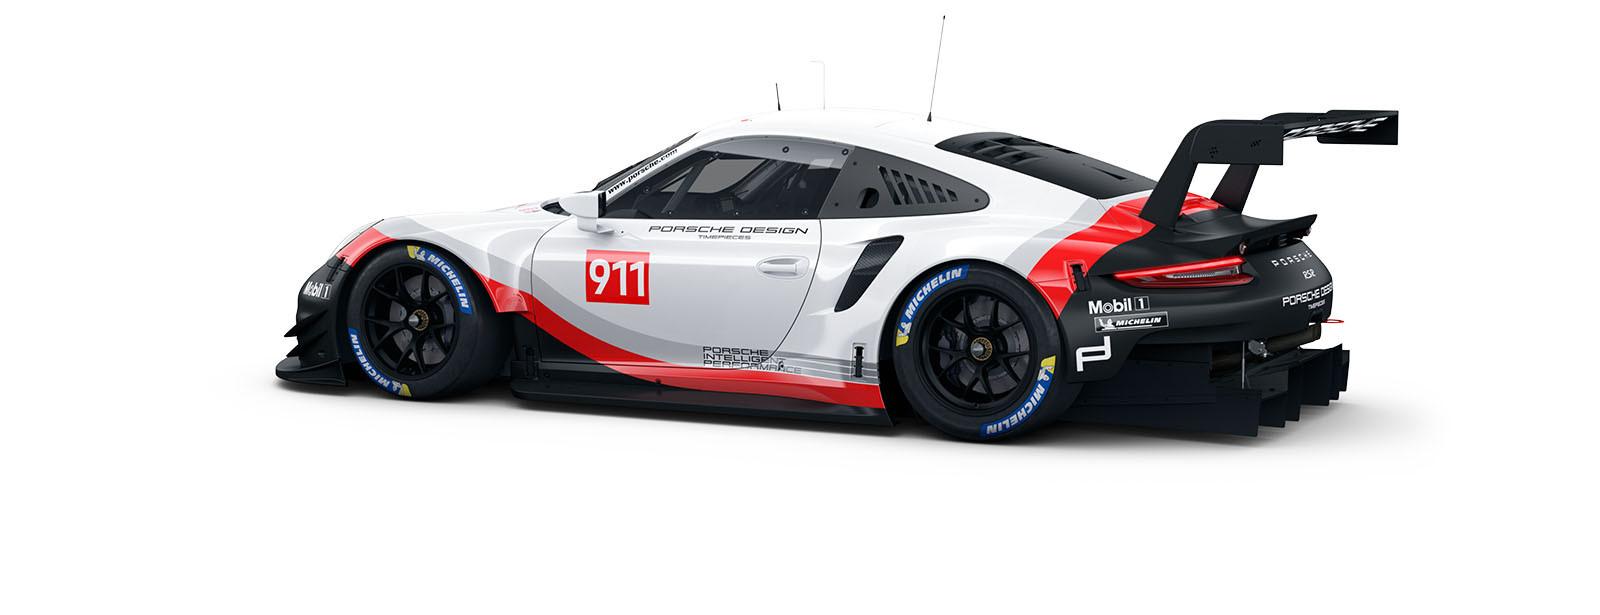 Ausmalbilder Porsche 911 Neu Porsche 911 Rsr Porsche Usa Das Bild